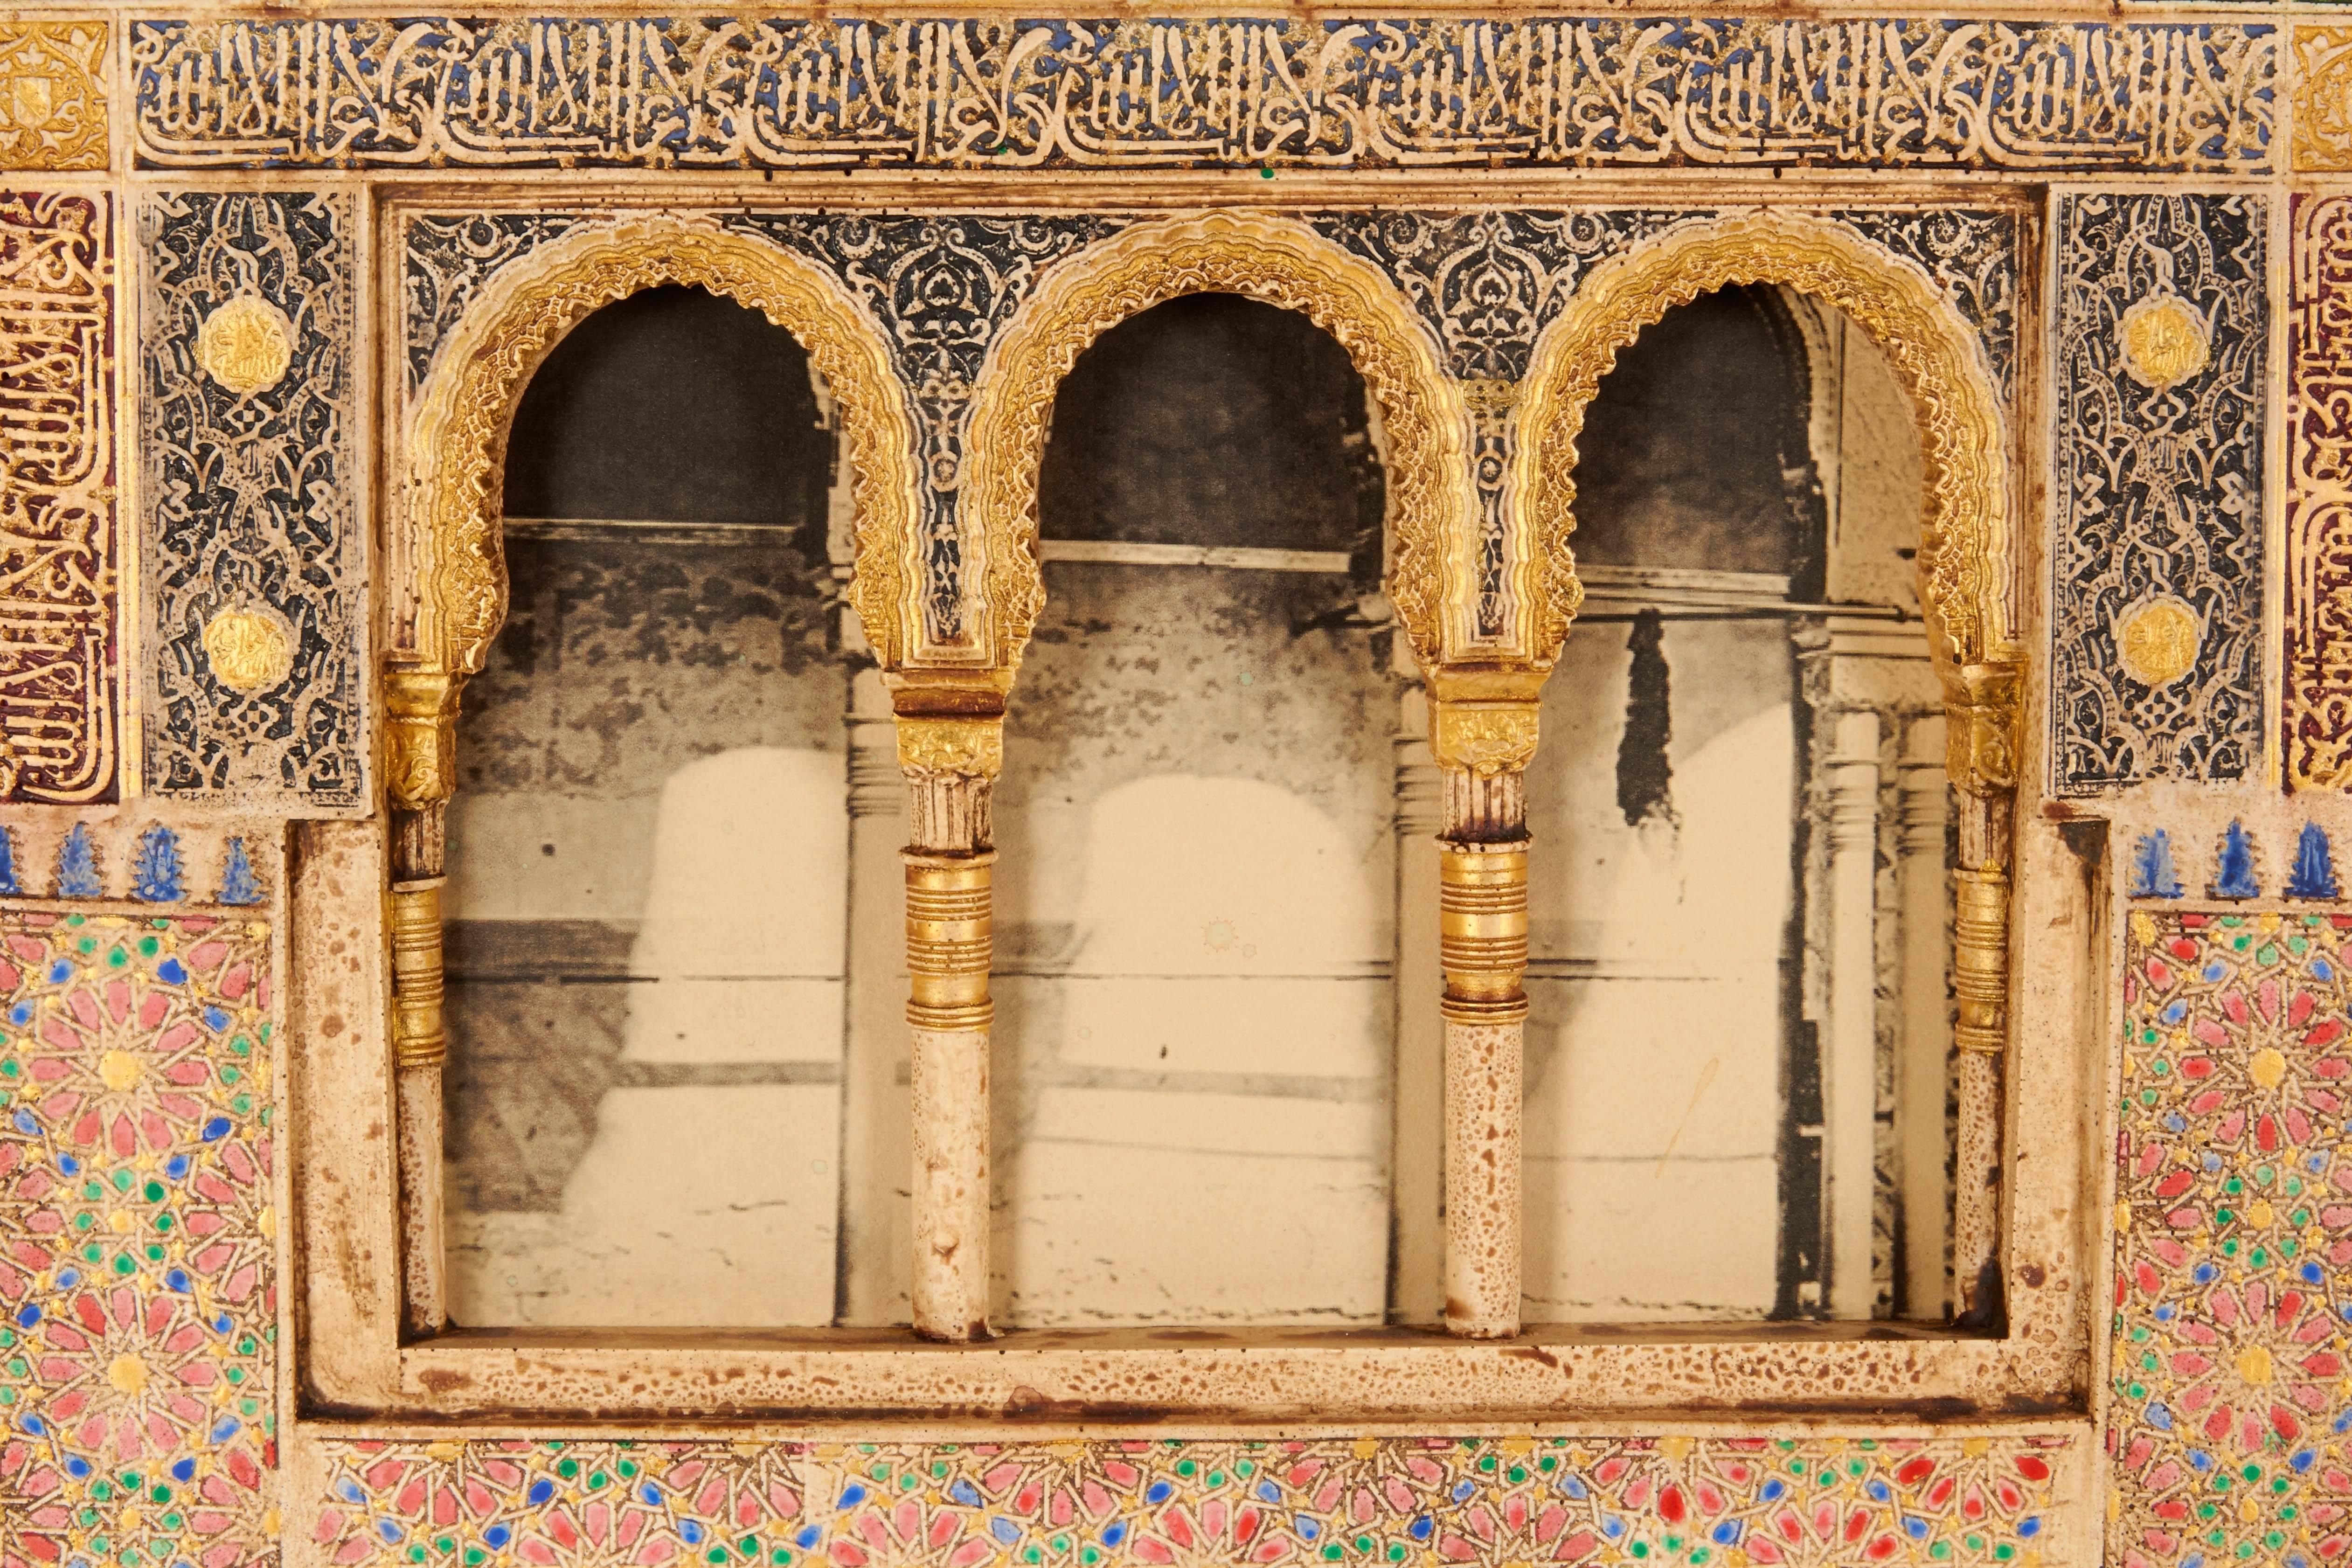 Spanish Plaster Wall Plaque Depicting the Alhambra Moorish Islamic ...